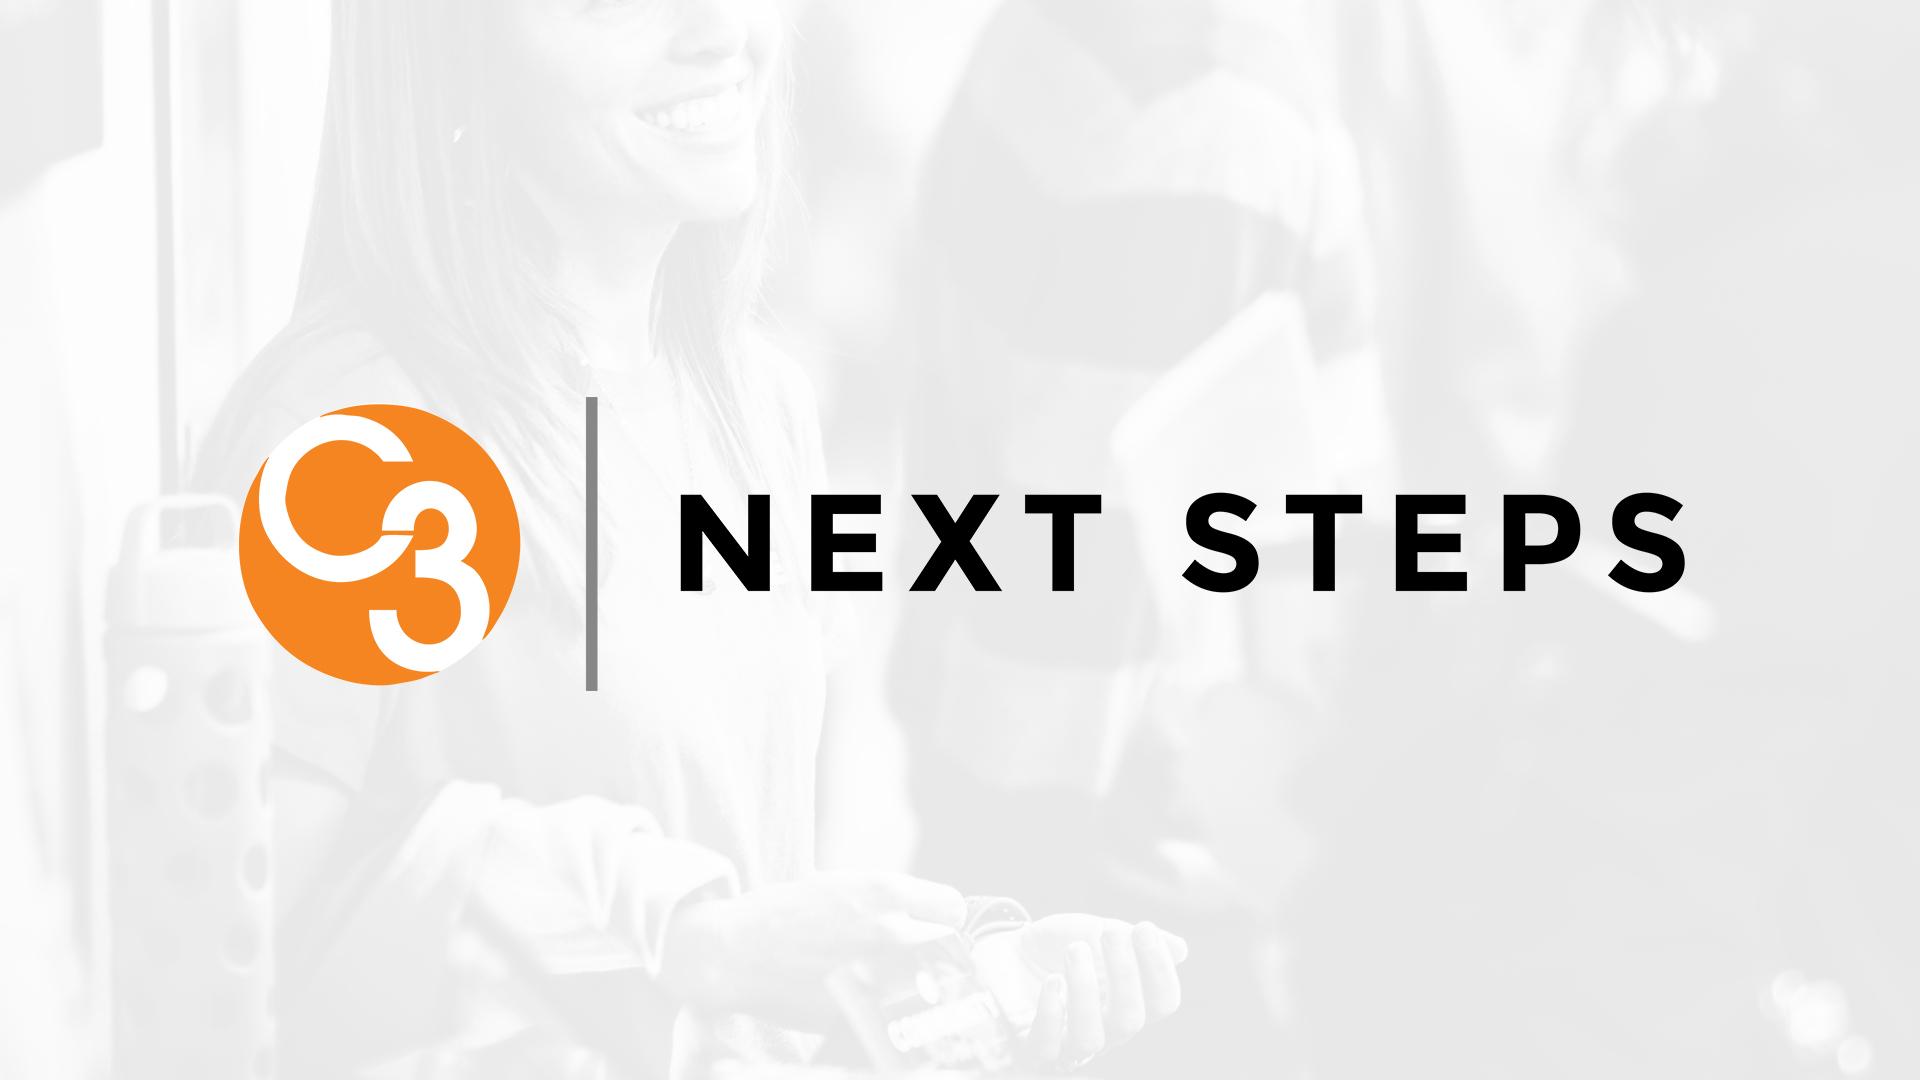 Next steps slide